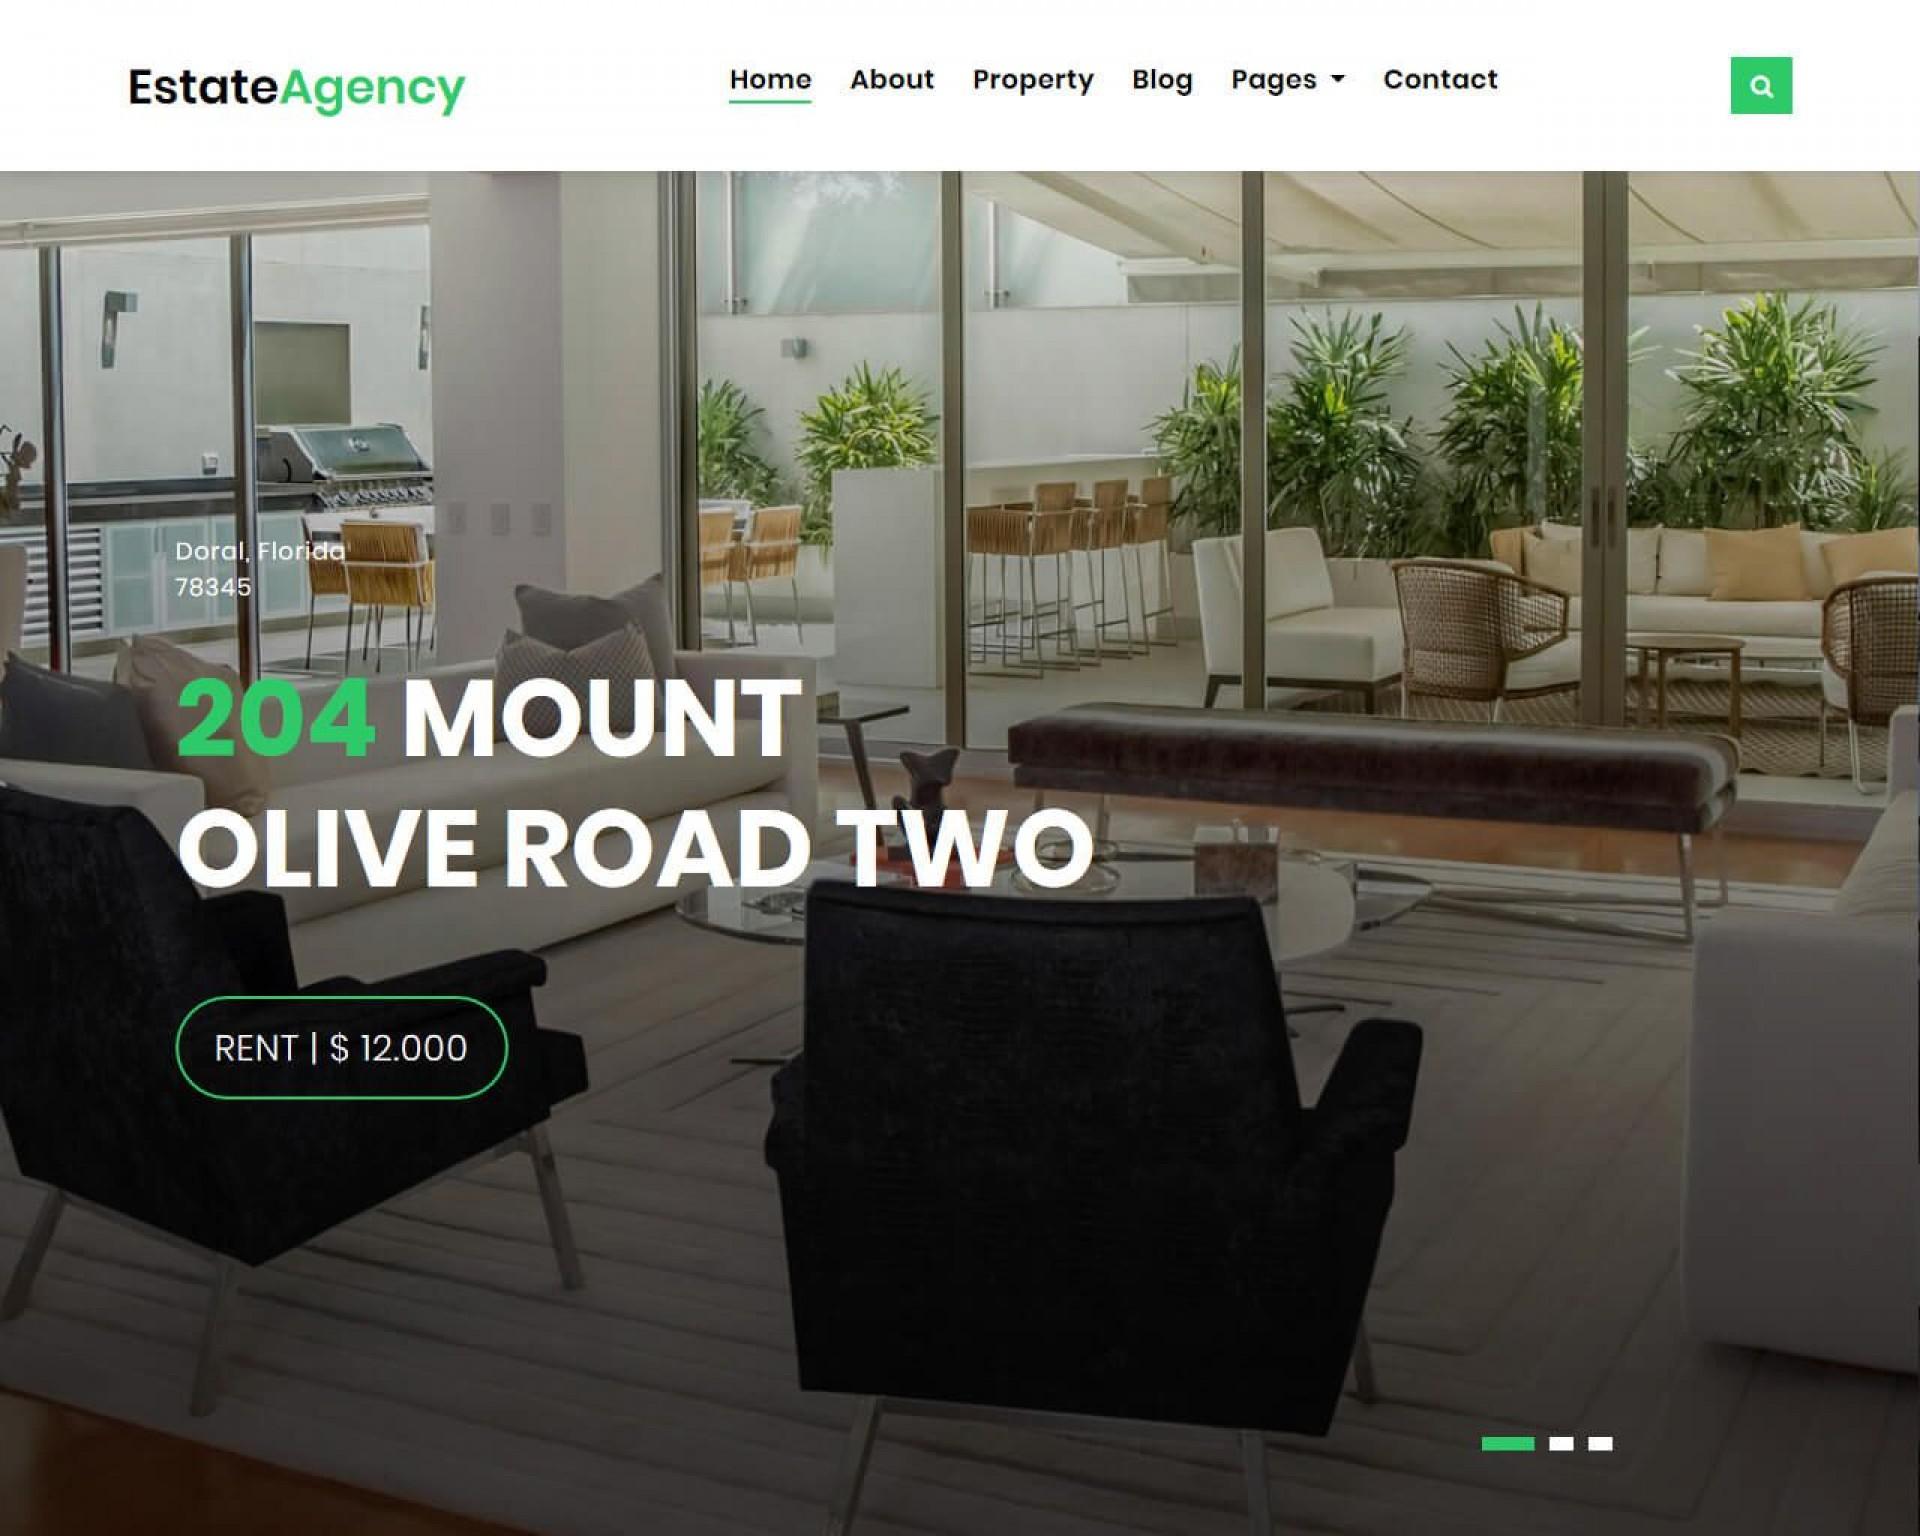 007 Striking Real Estate Website Template Sample  Templates Bootstrap Free Html5 Best Wordpres1920